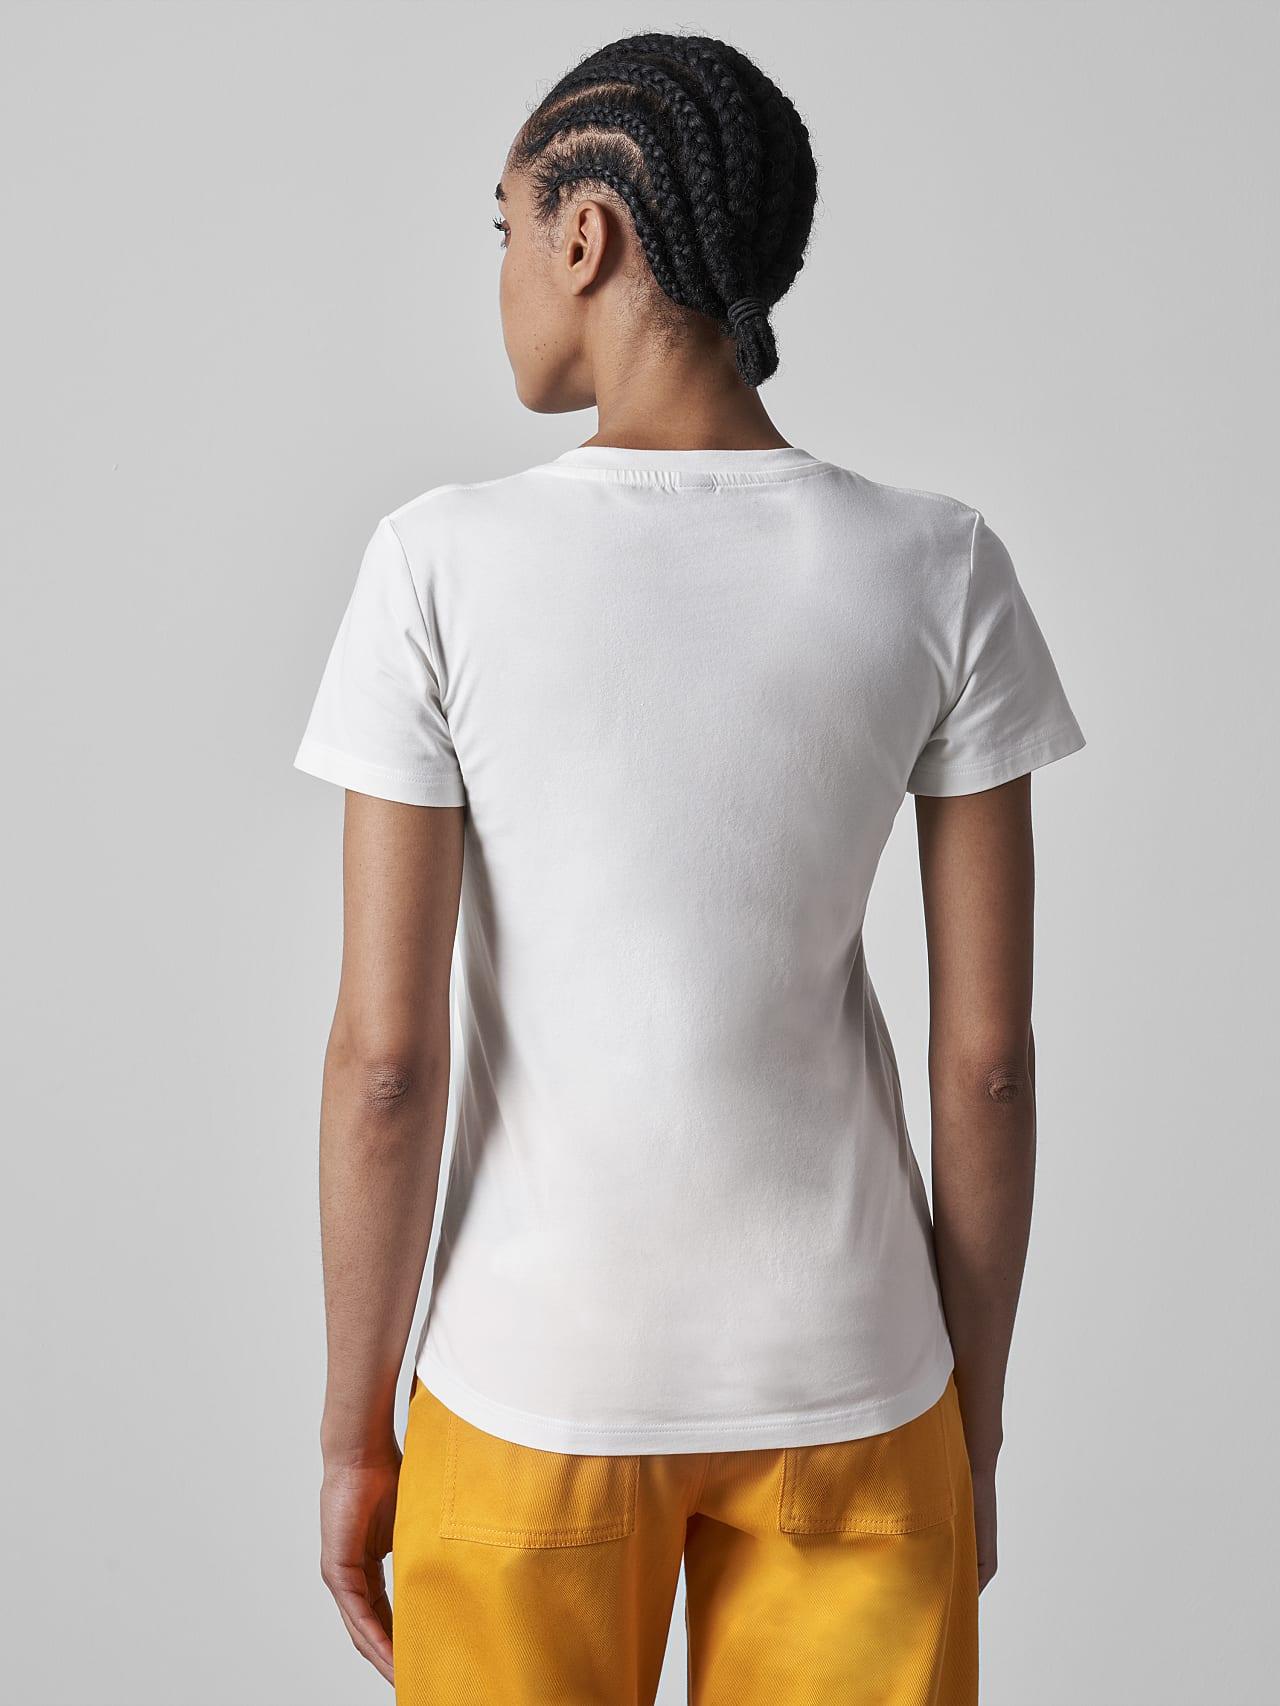 JANPA V1.Y5.02 Logo Print T-Shirt offwhite Front Main Alpha Tauri